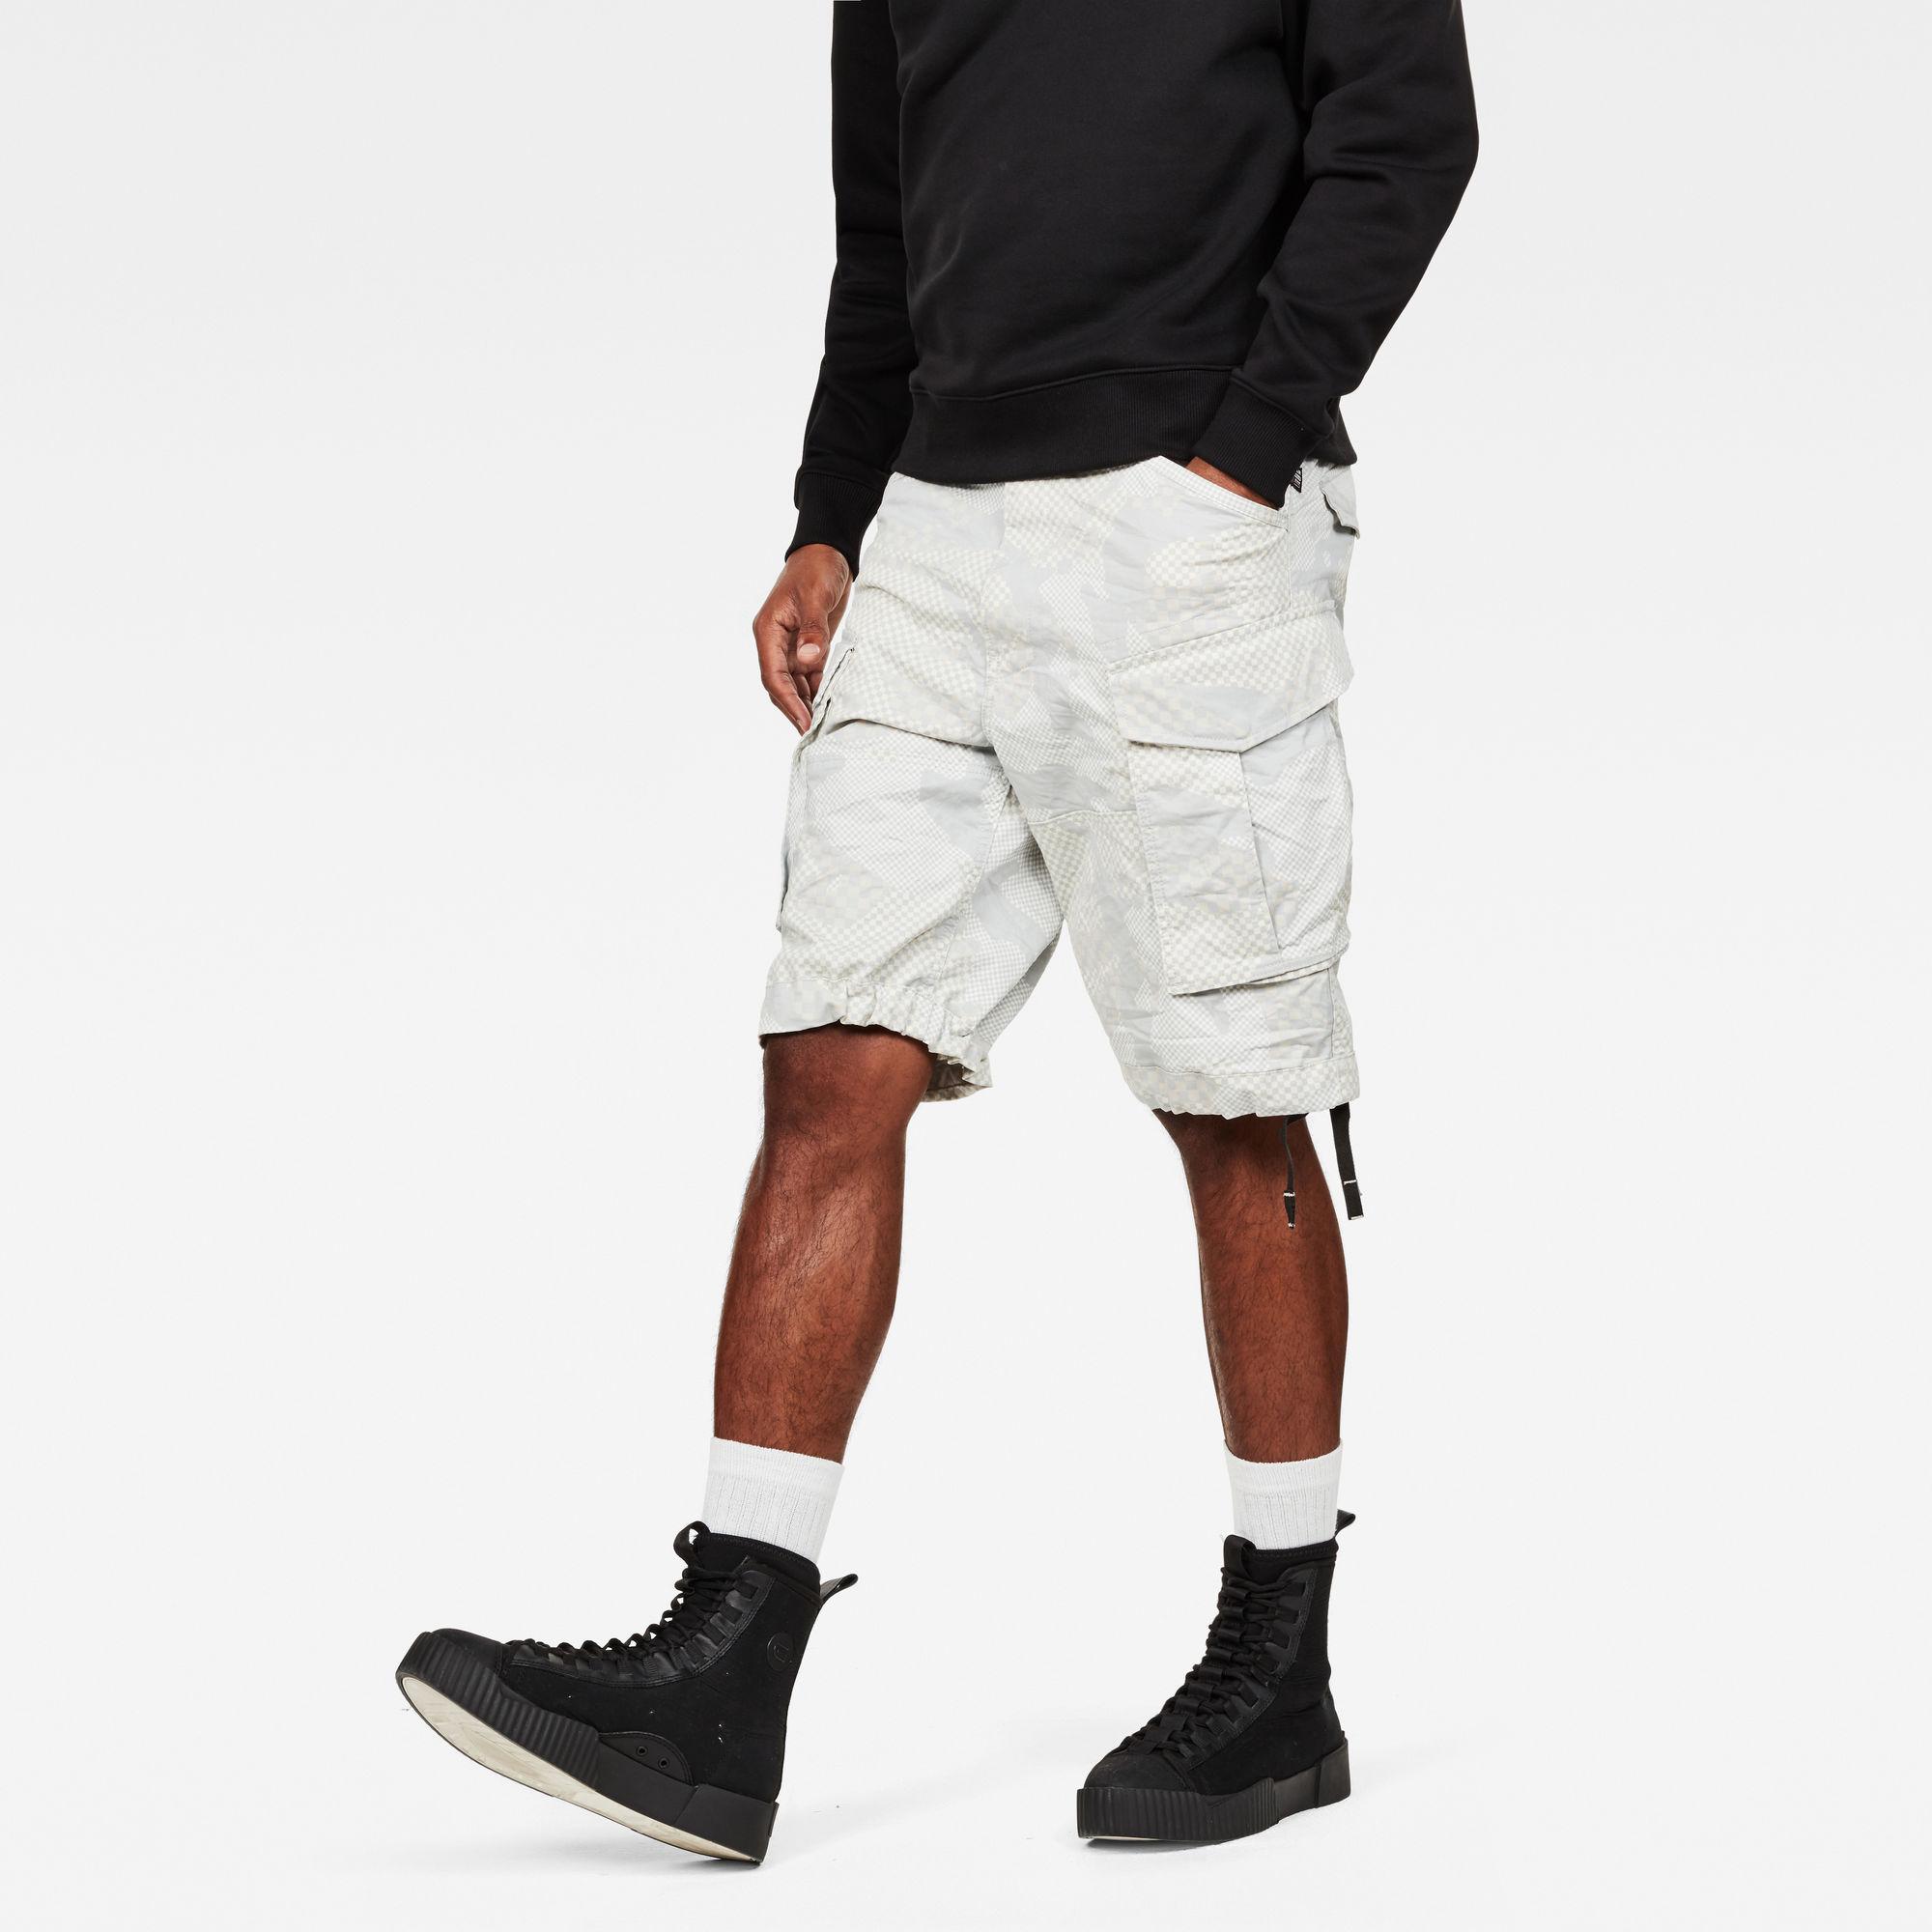 Rovic Qane Relaxed 1 2 Length Shorts